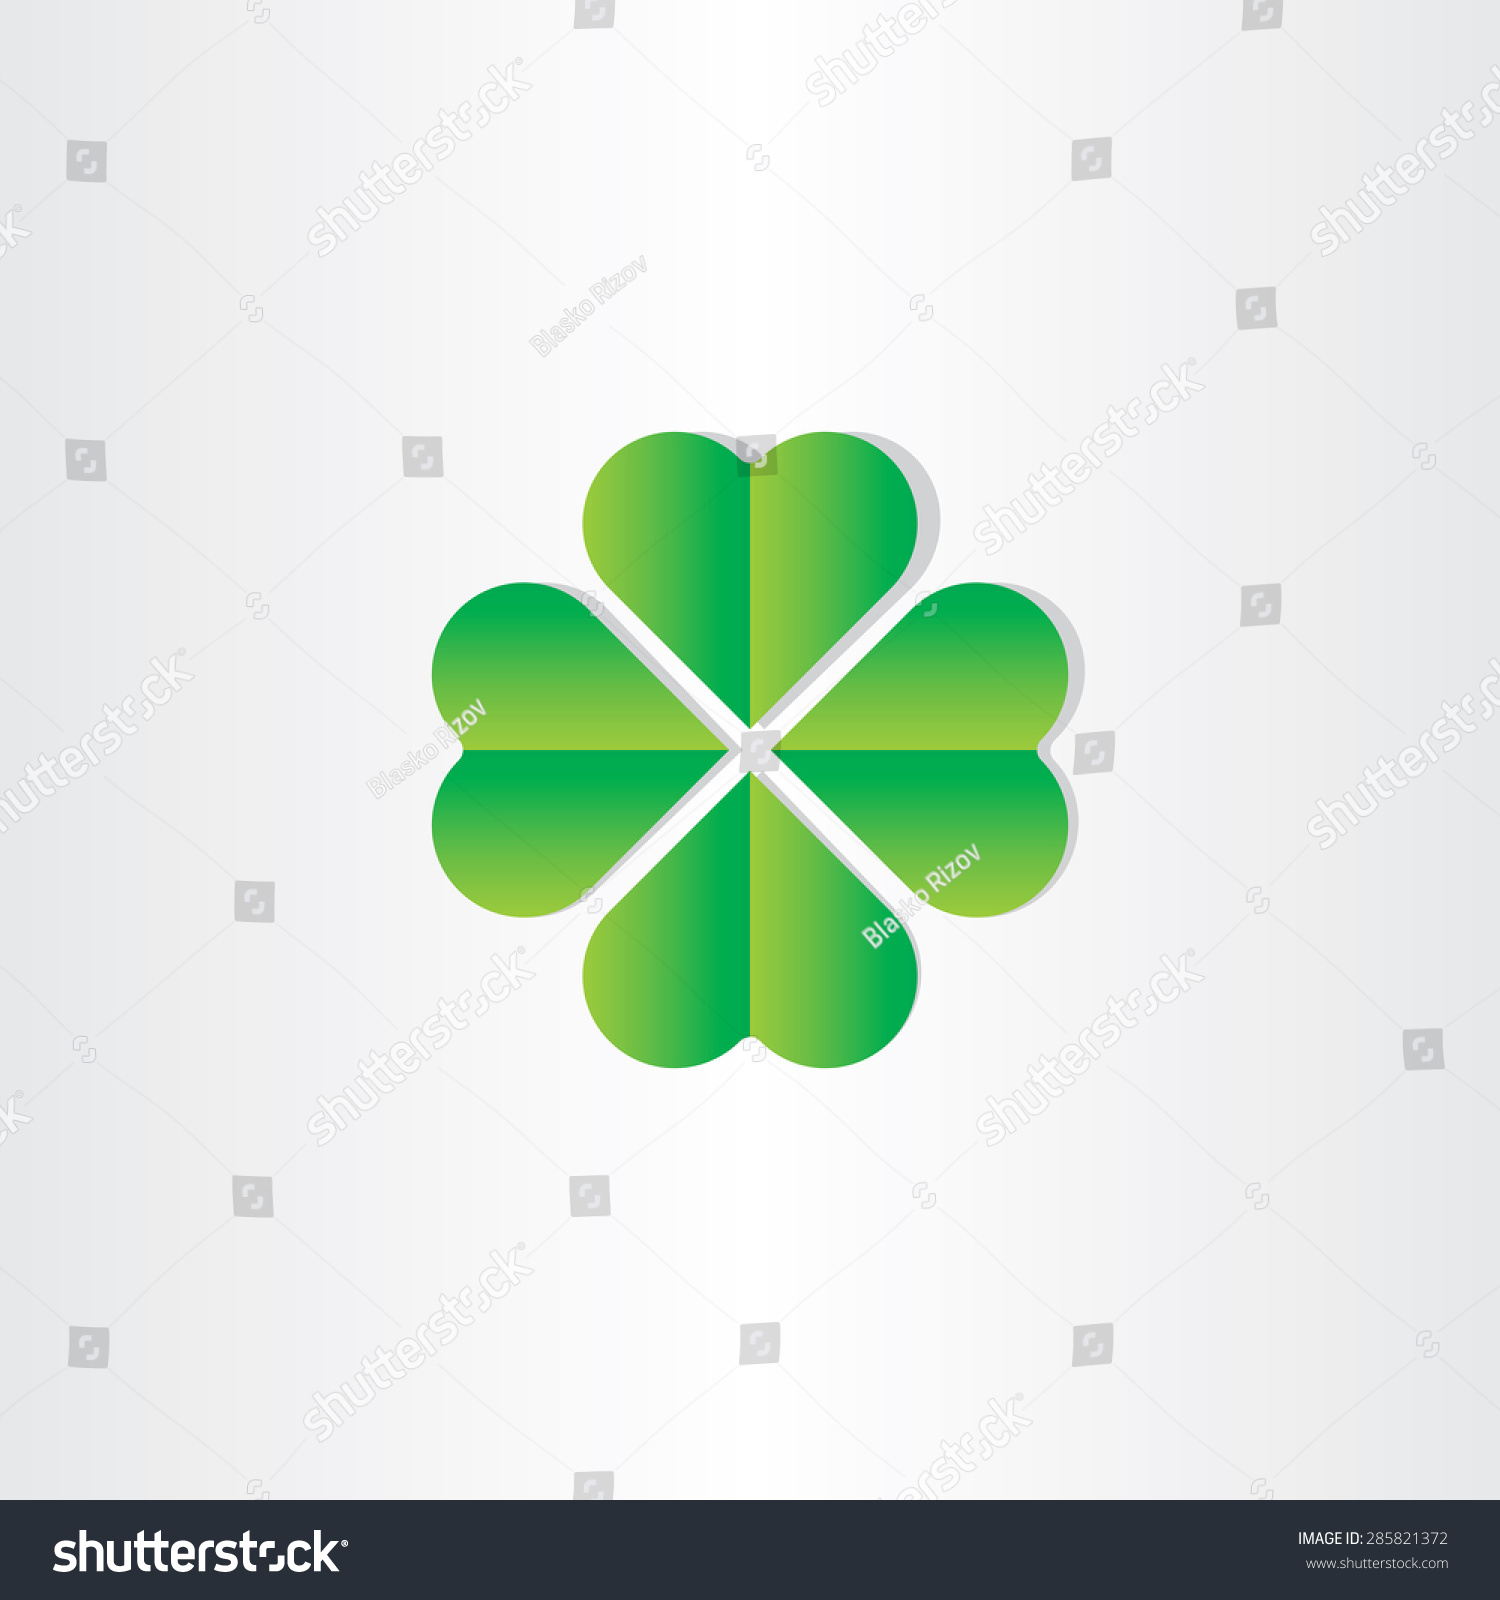 Green clover luck st patrick symbol stock vector 285821372 green clover luck st patrick symbol stock vector 285821372 shutterstock biocorpaavc